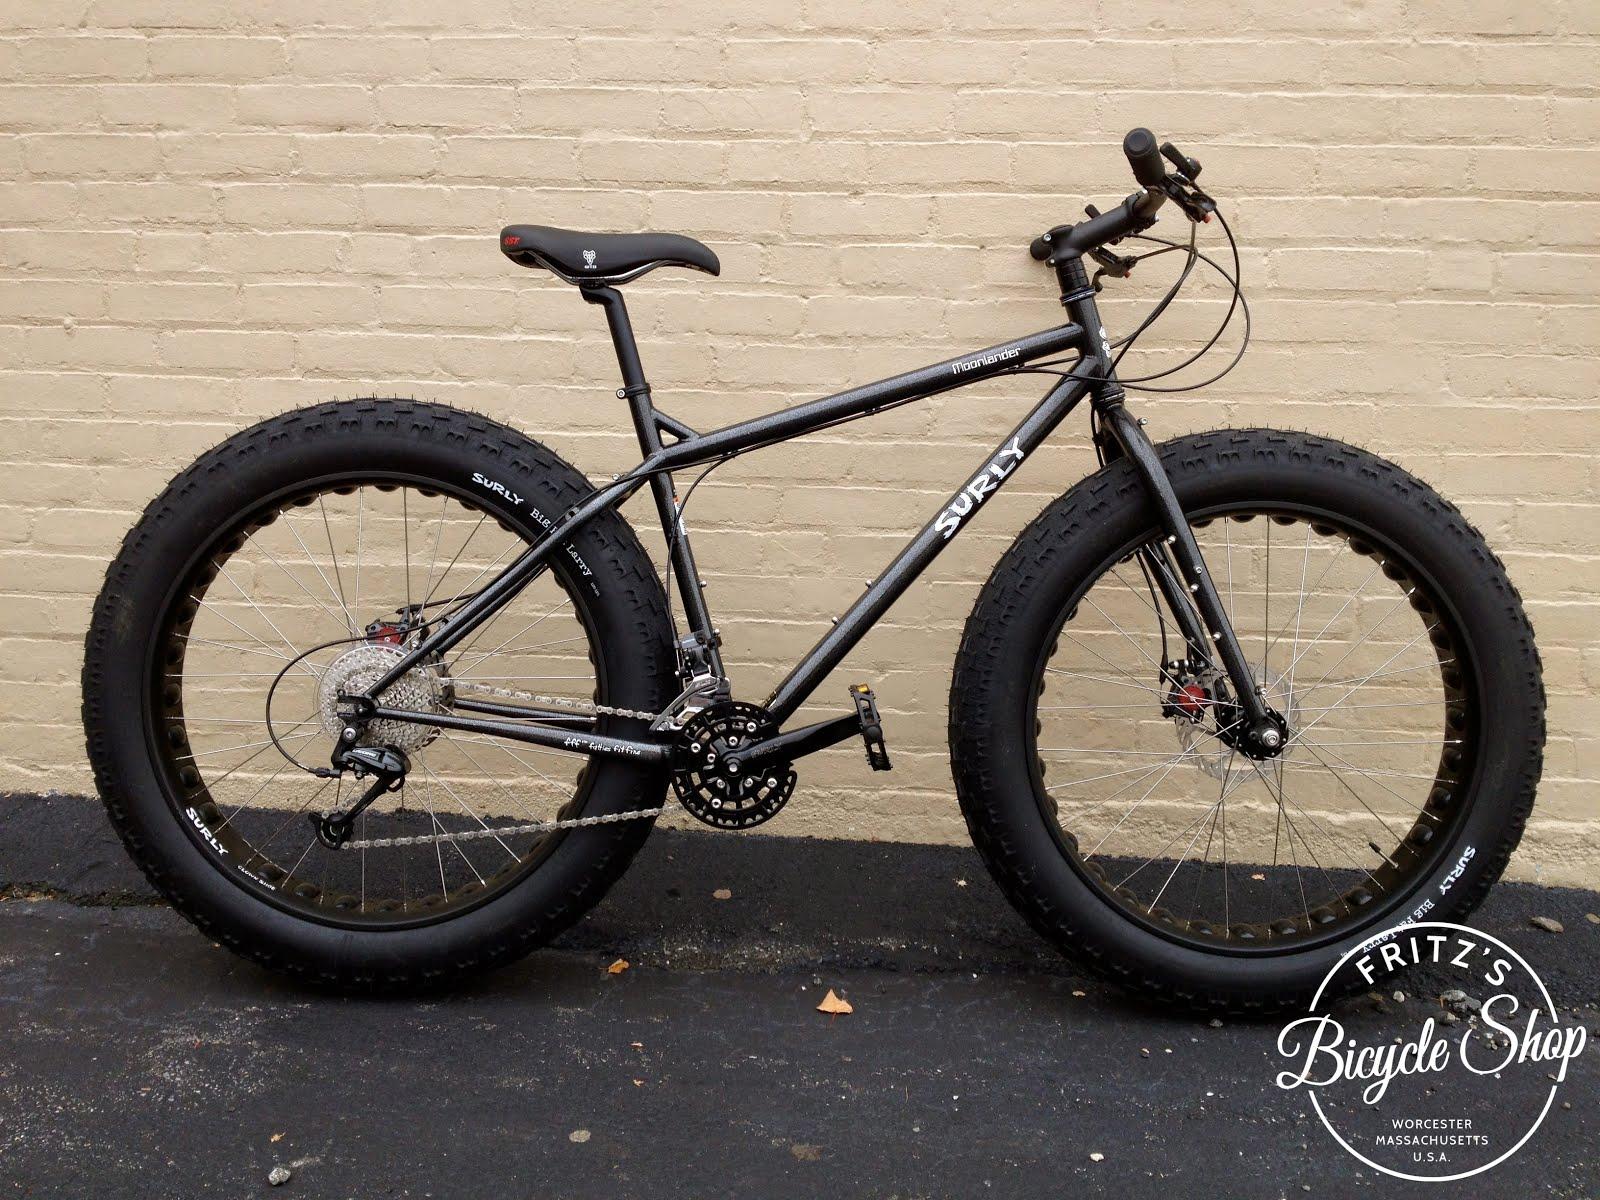 FRITZ'S BICYCLE SHOP worcester ma: Surly Moonlander Demo Bike